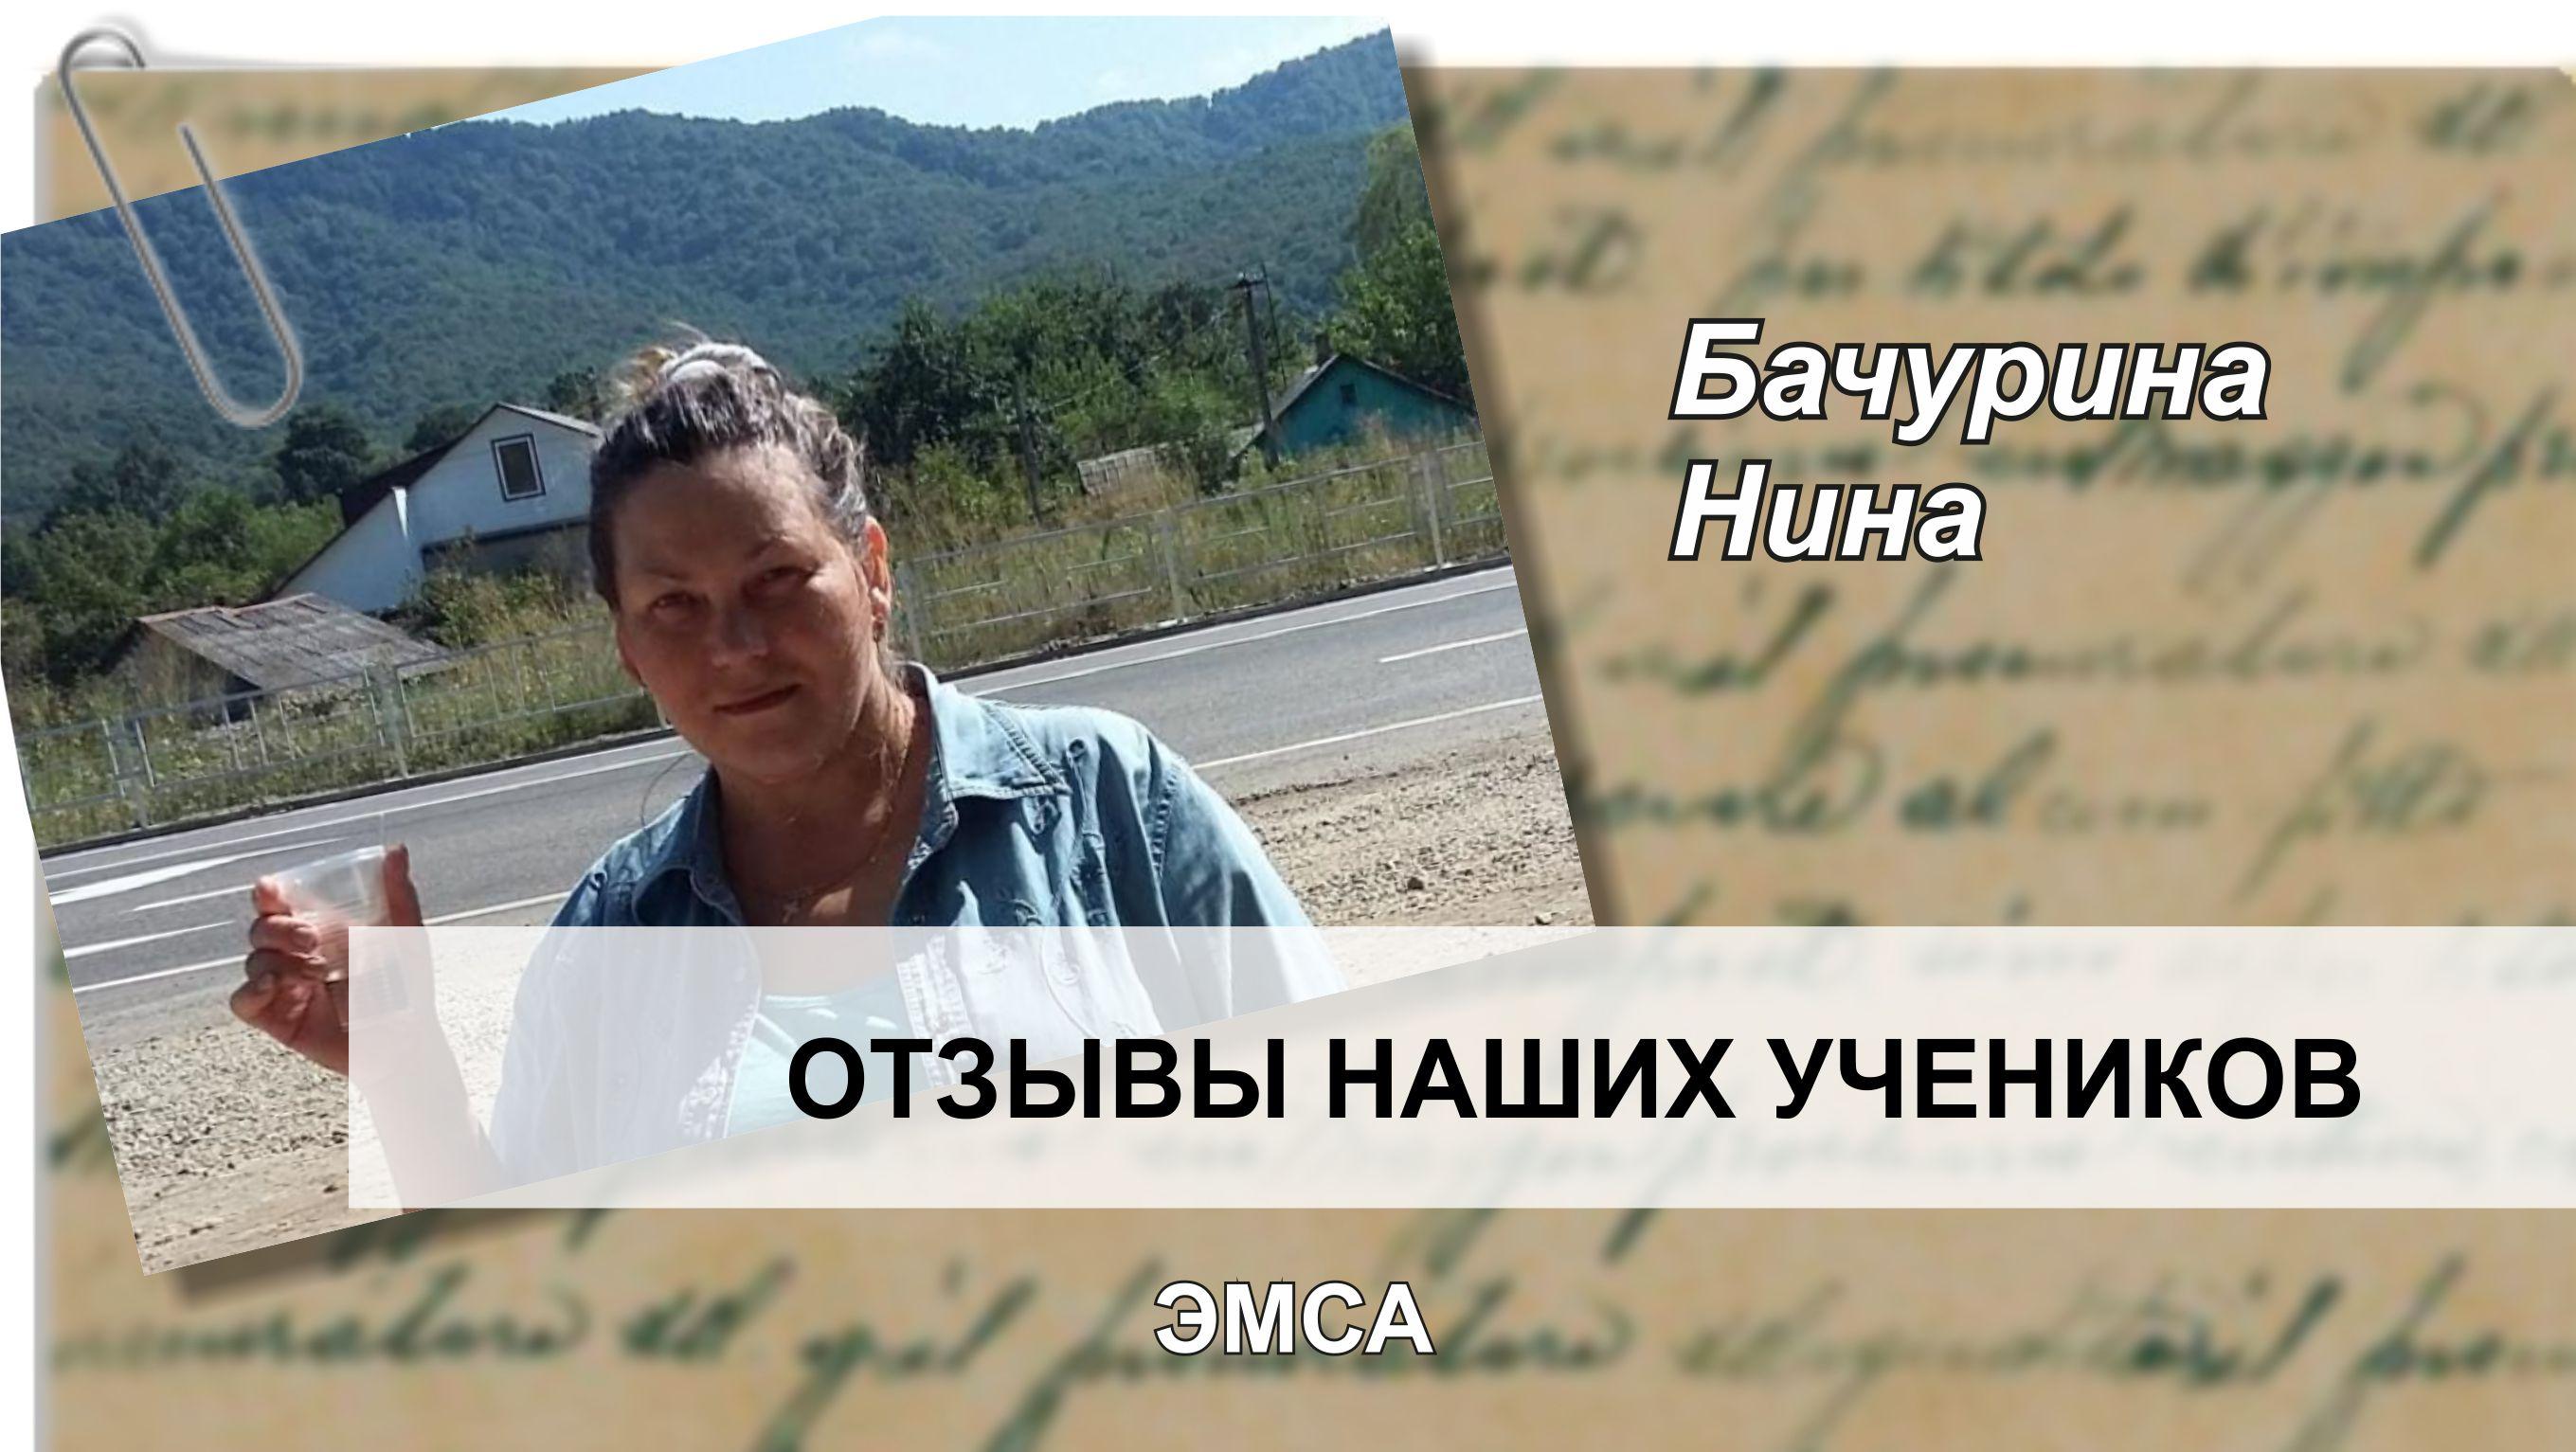 Бачирина Нина отзыв ЭМСА